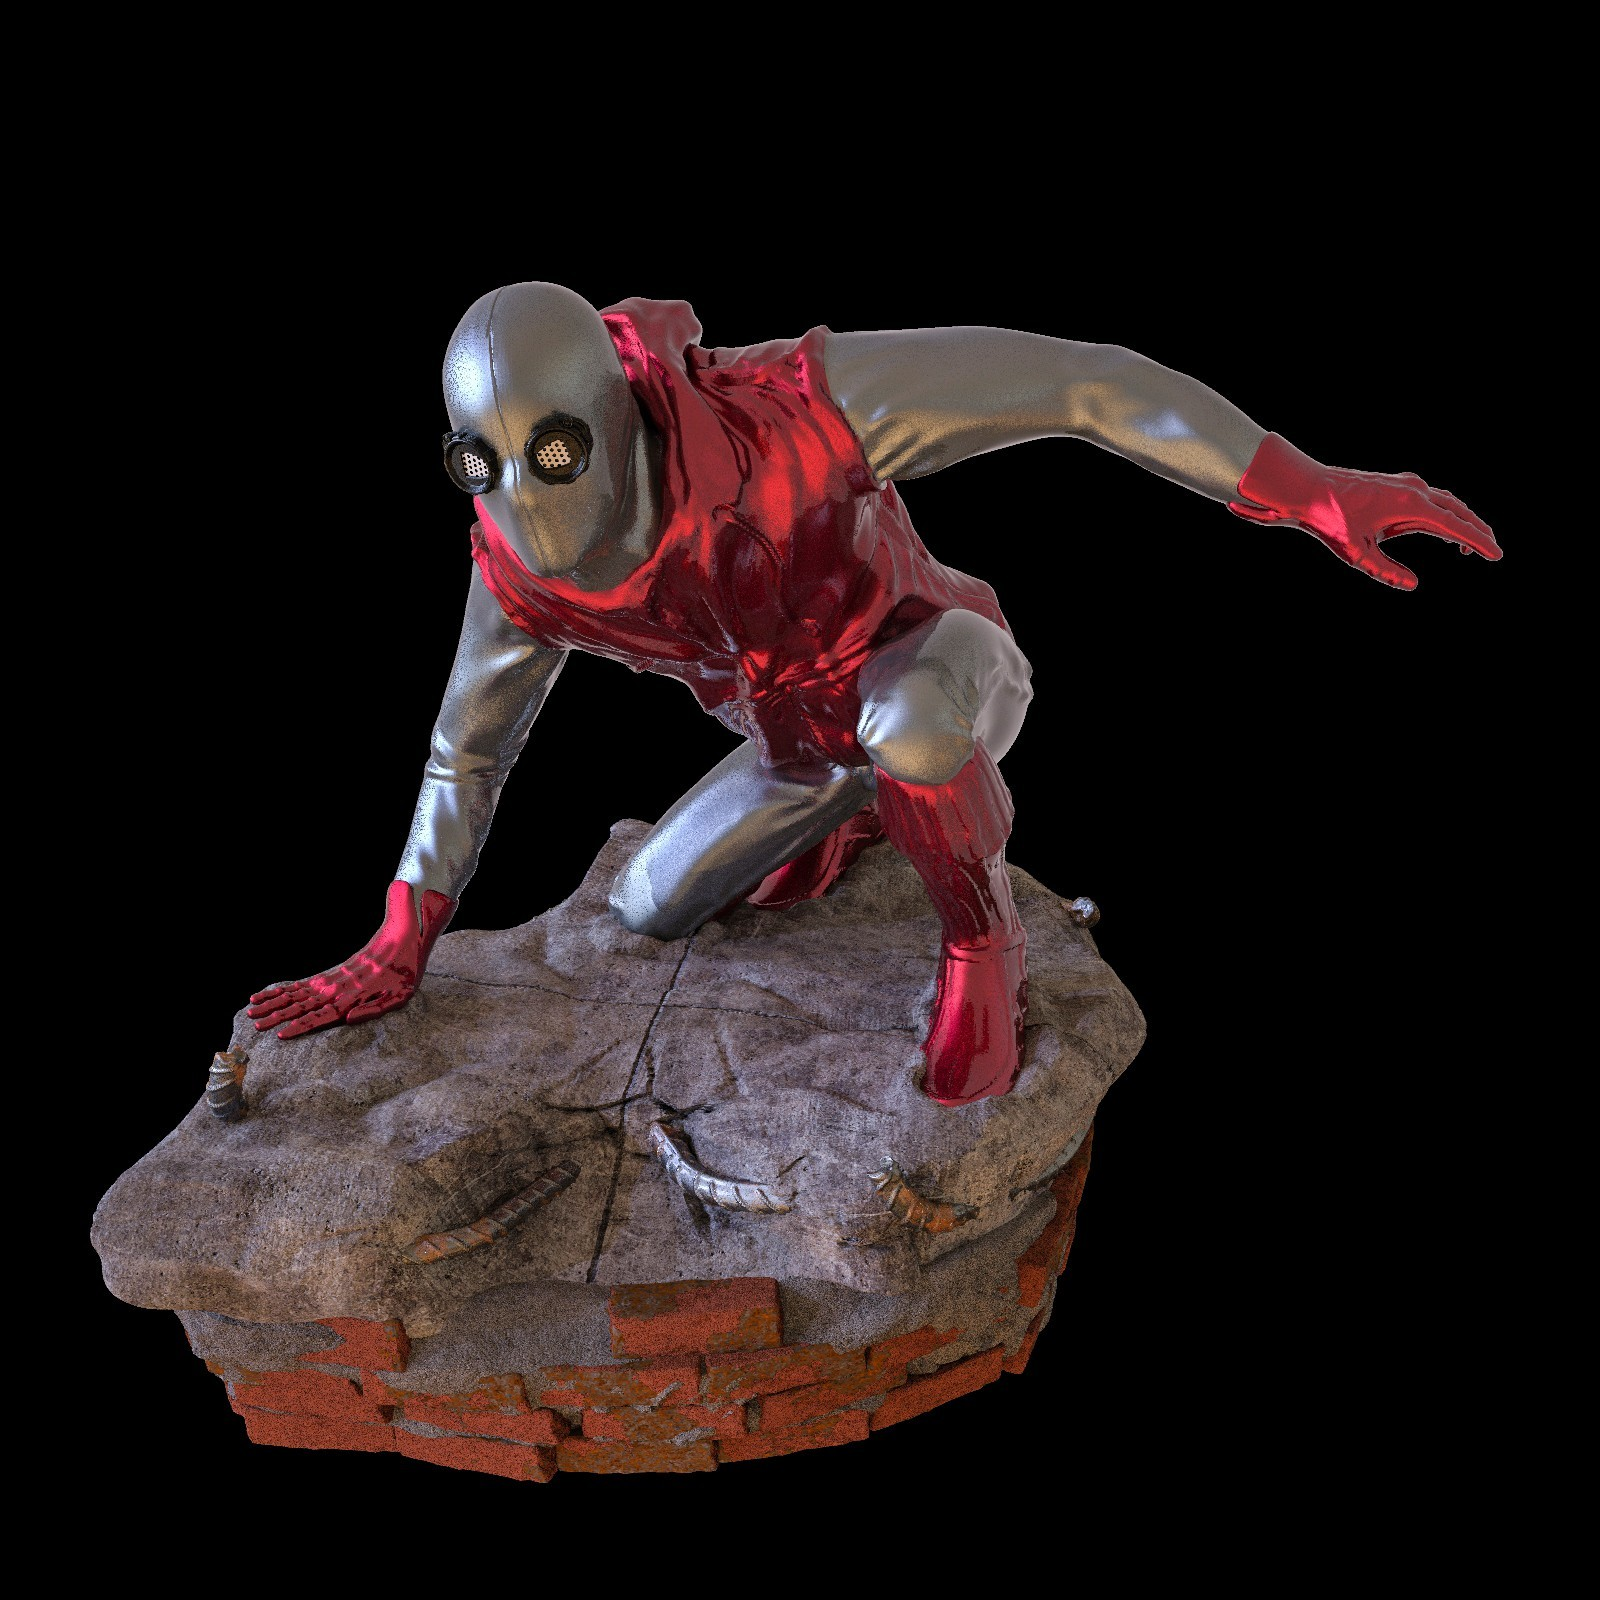 24.jpg Download STL file Spider-Man Homemade Suit • Design to 3D print, tolgaaxu